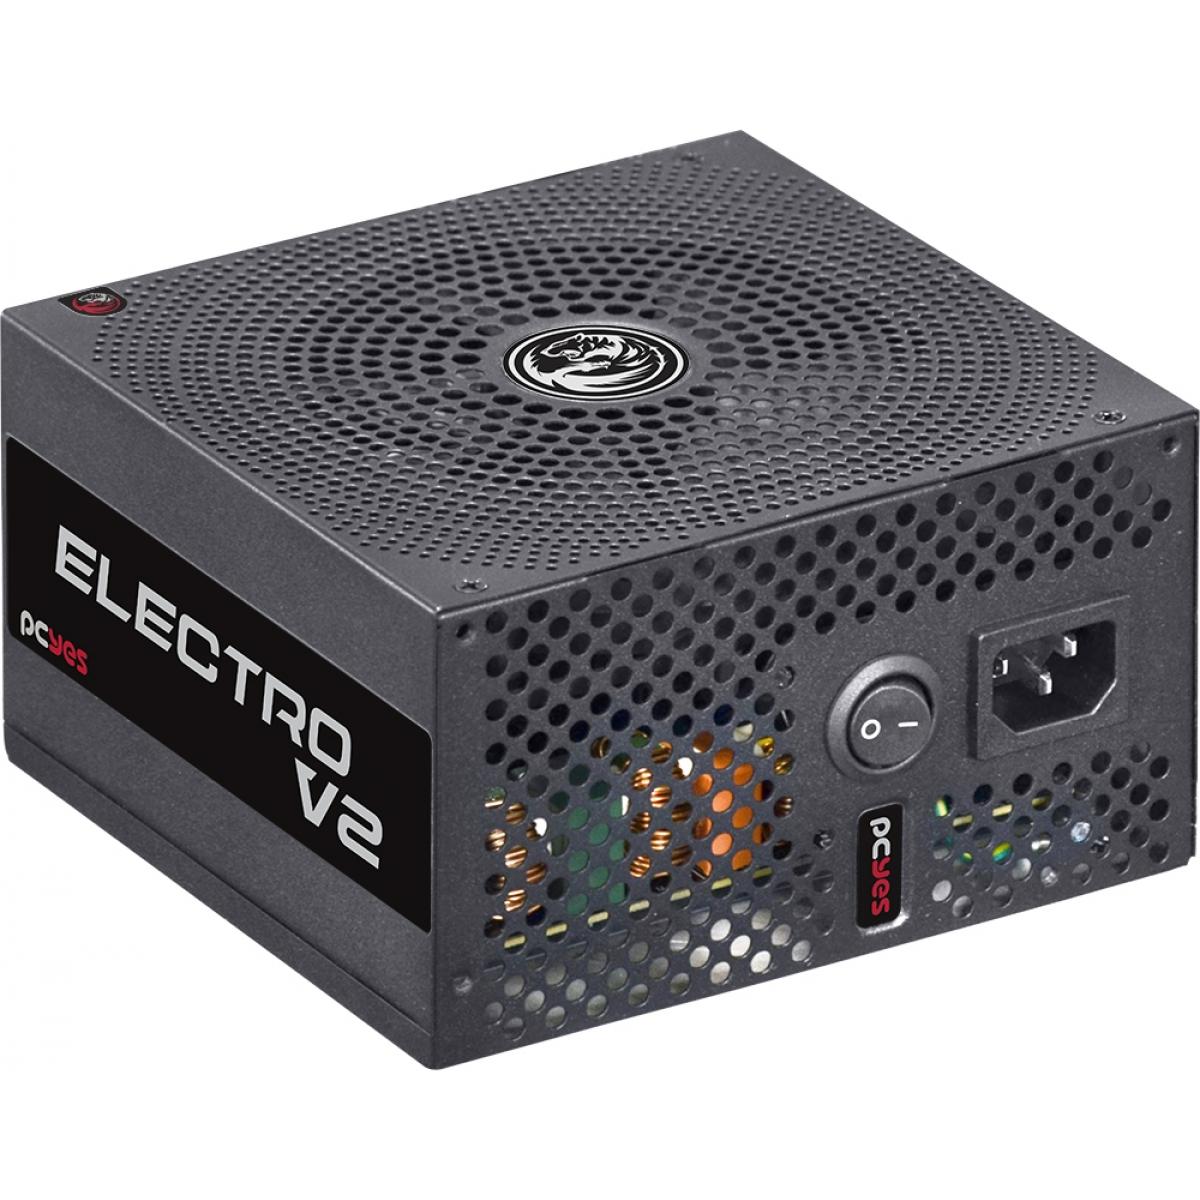 Fonte PCYES Electro V2, 600W, 80 Plus Bronze, PFC Ativo, ELECV2PTO600W